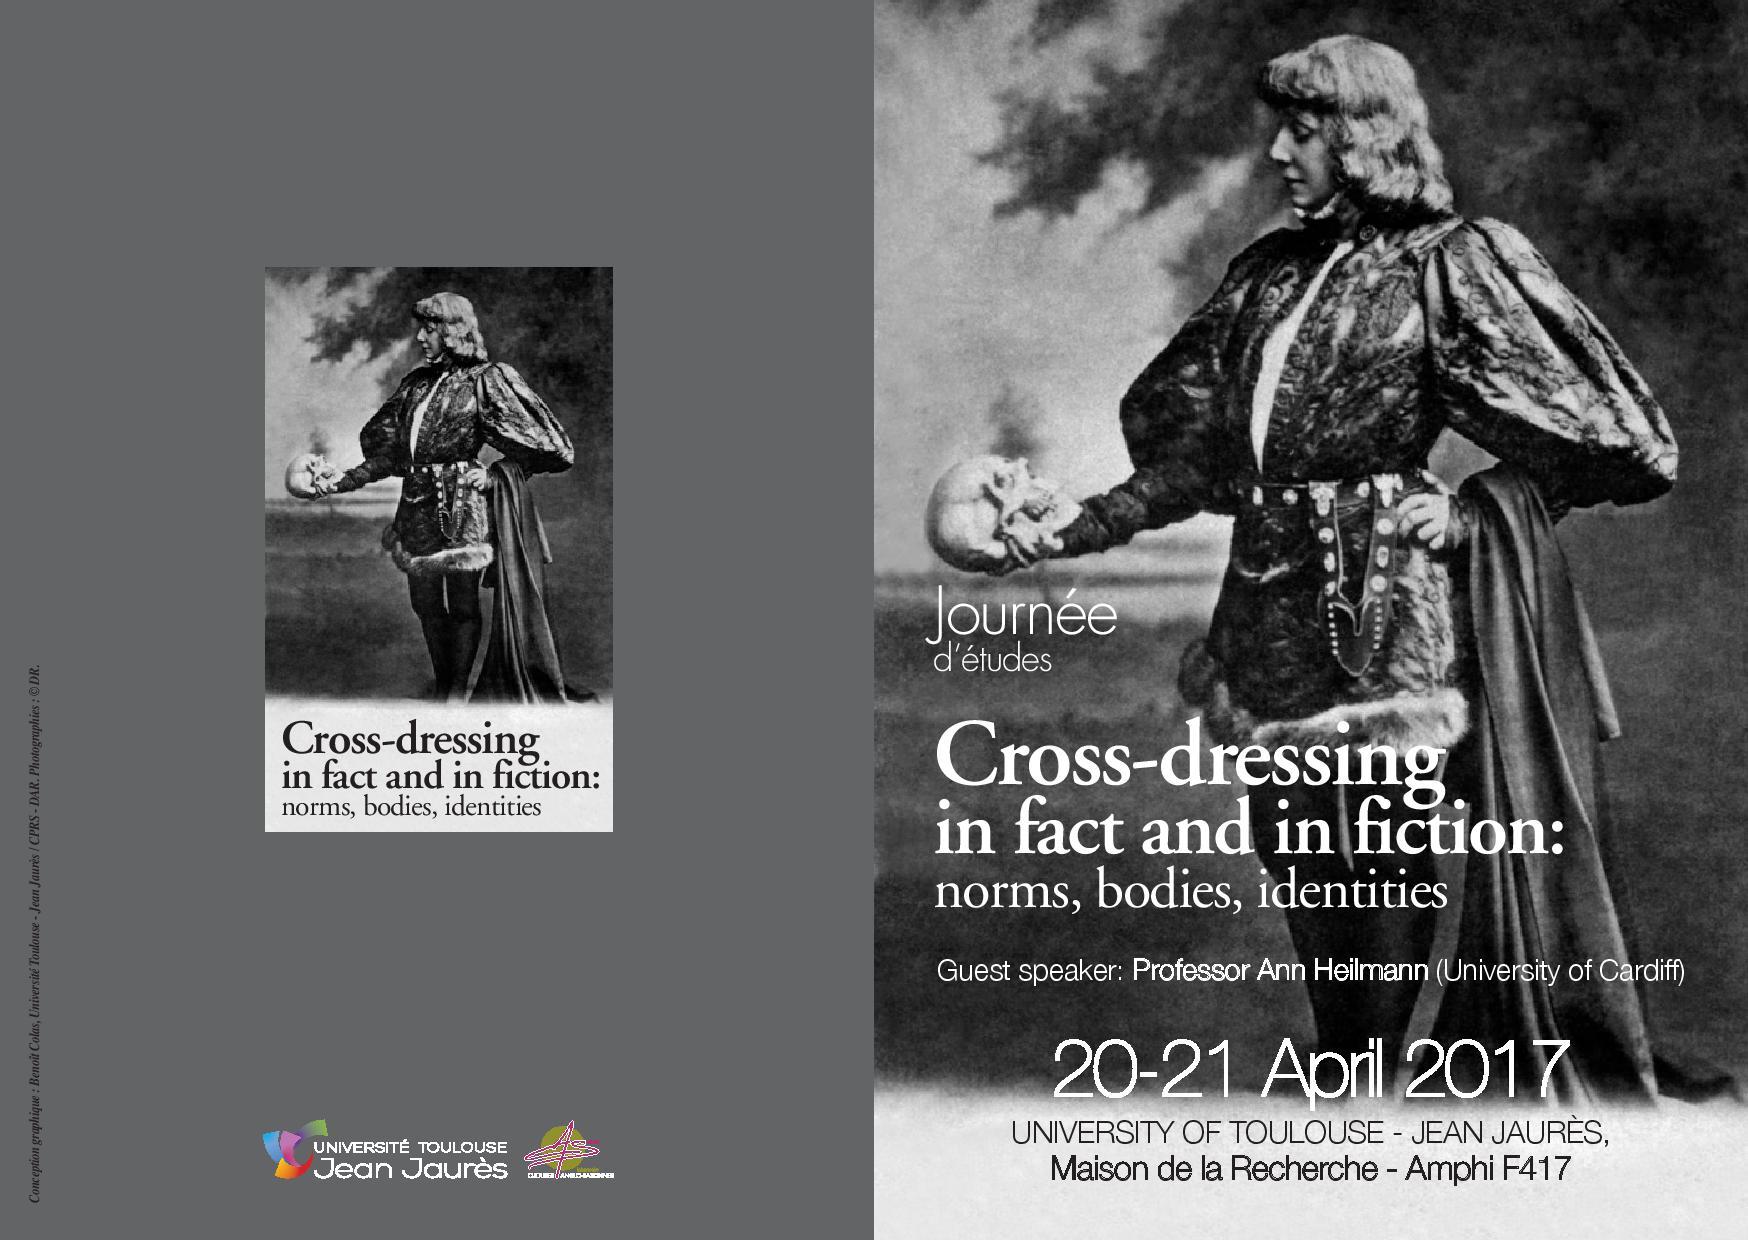 programme-cross-dressing-page-001.jpg